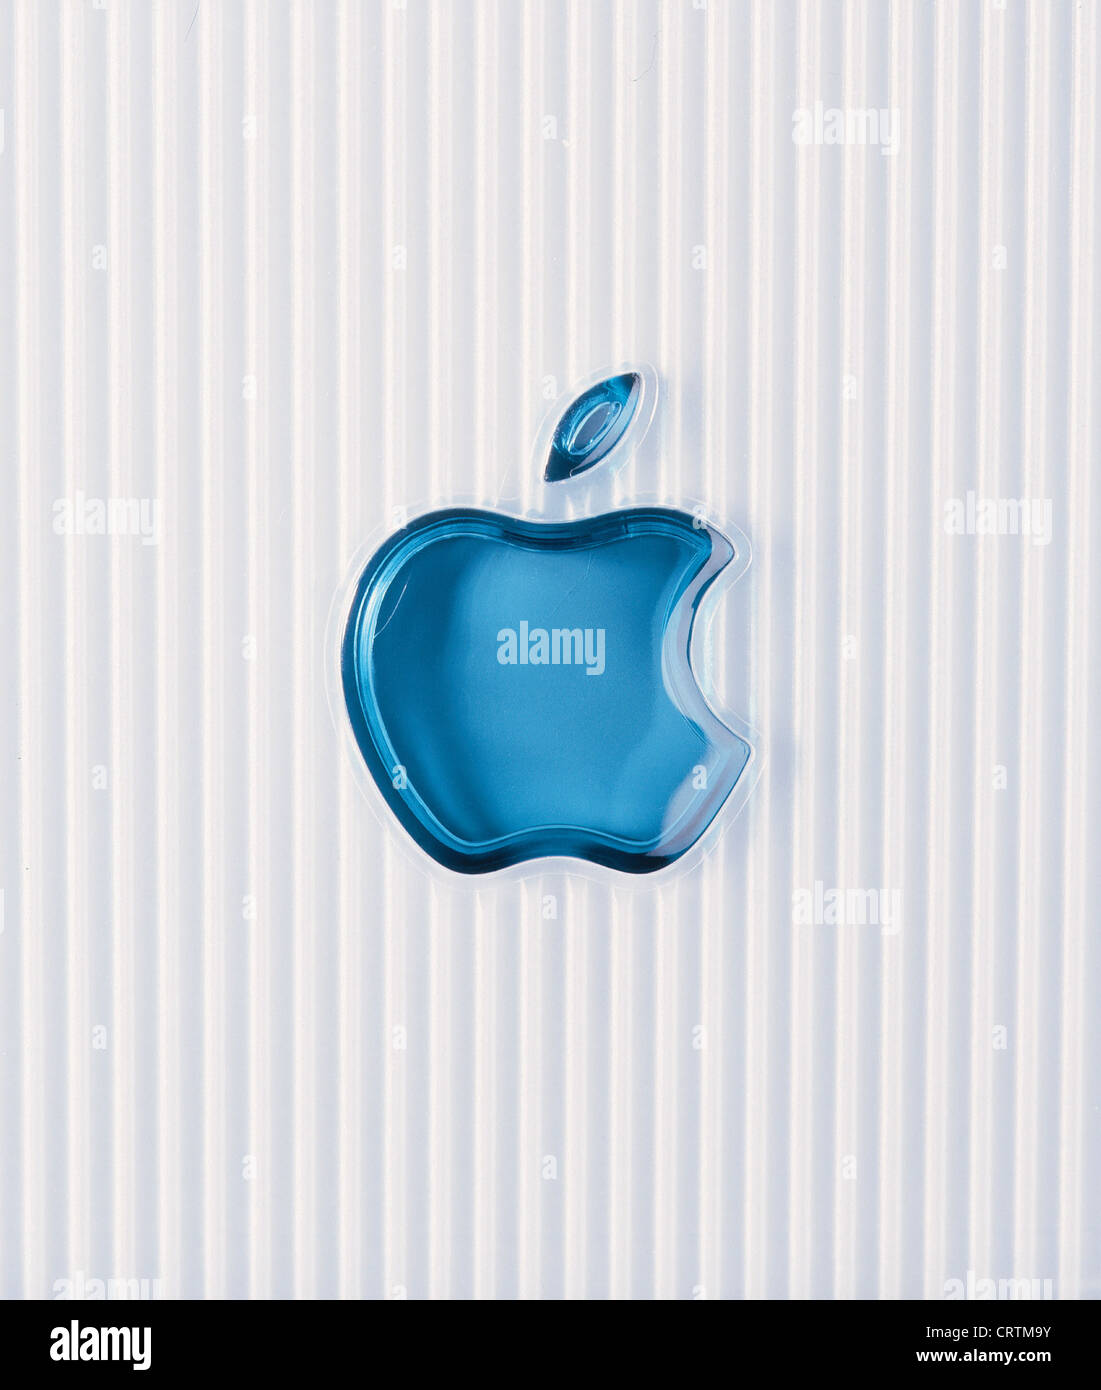 apple logo stock photo: 49100631 - alamy